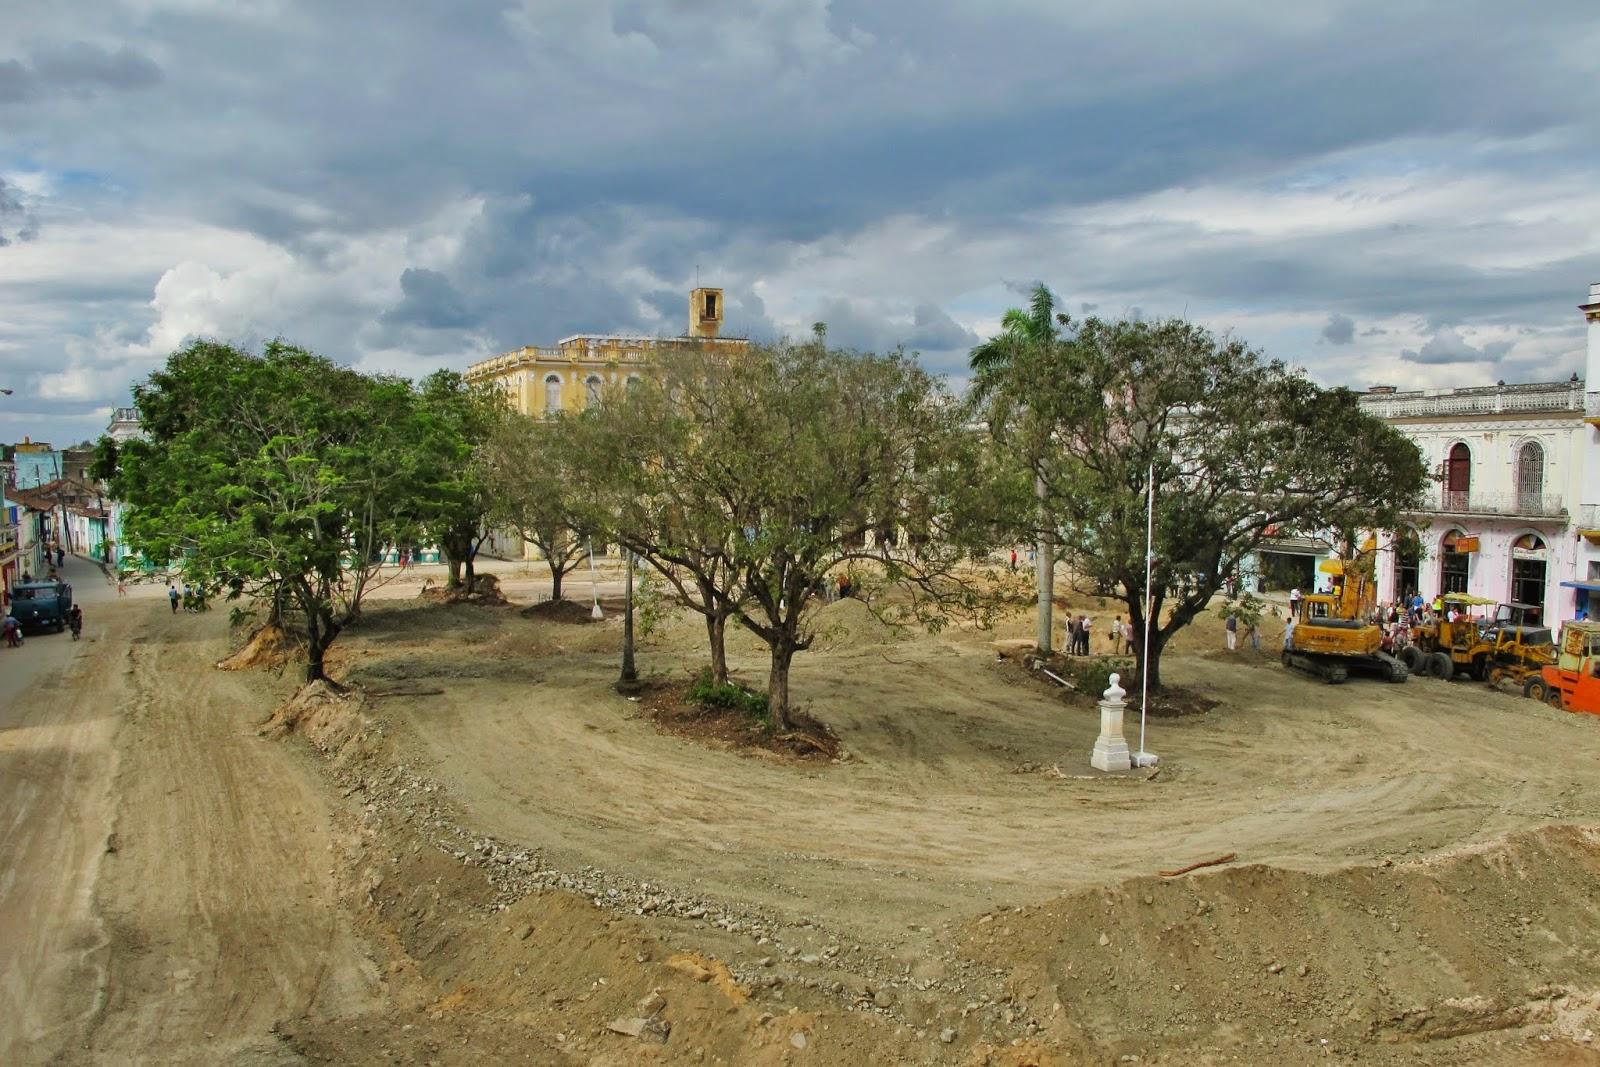 Parque Serafín Sanchez, em Sanctu Spiritus, na região central de Cuba